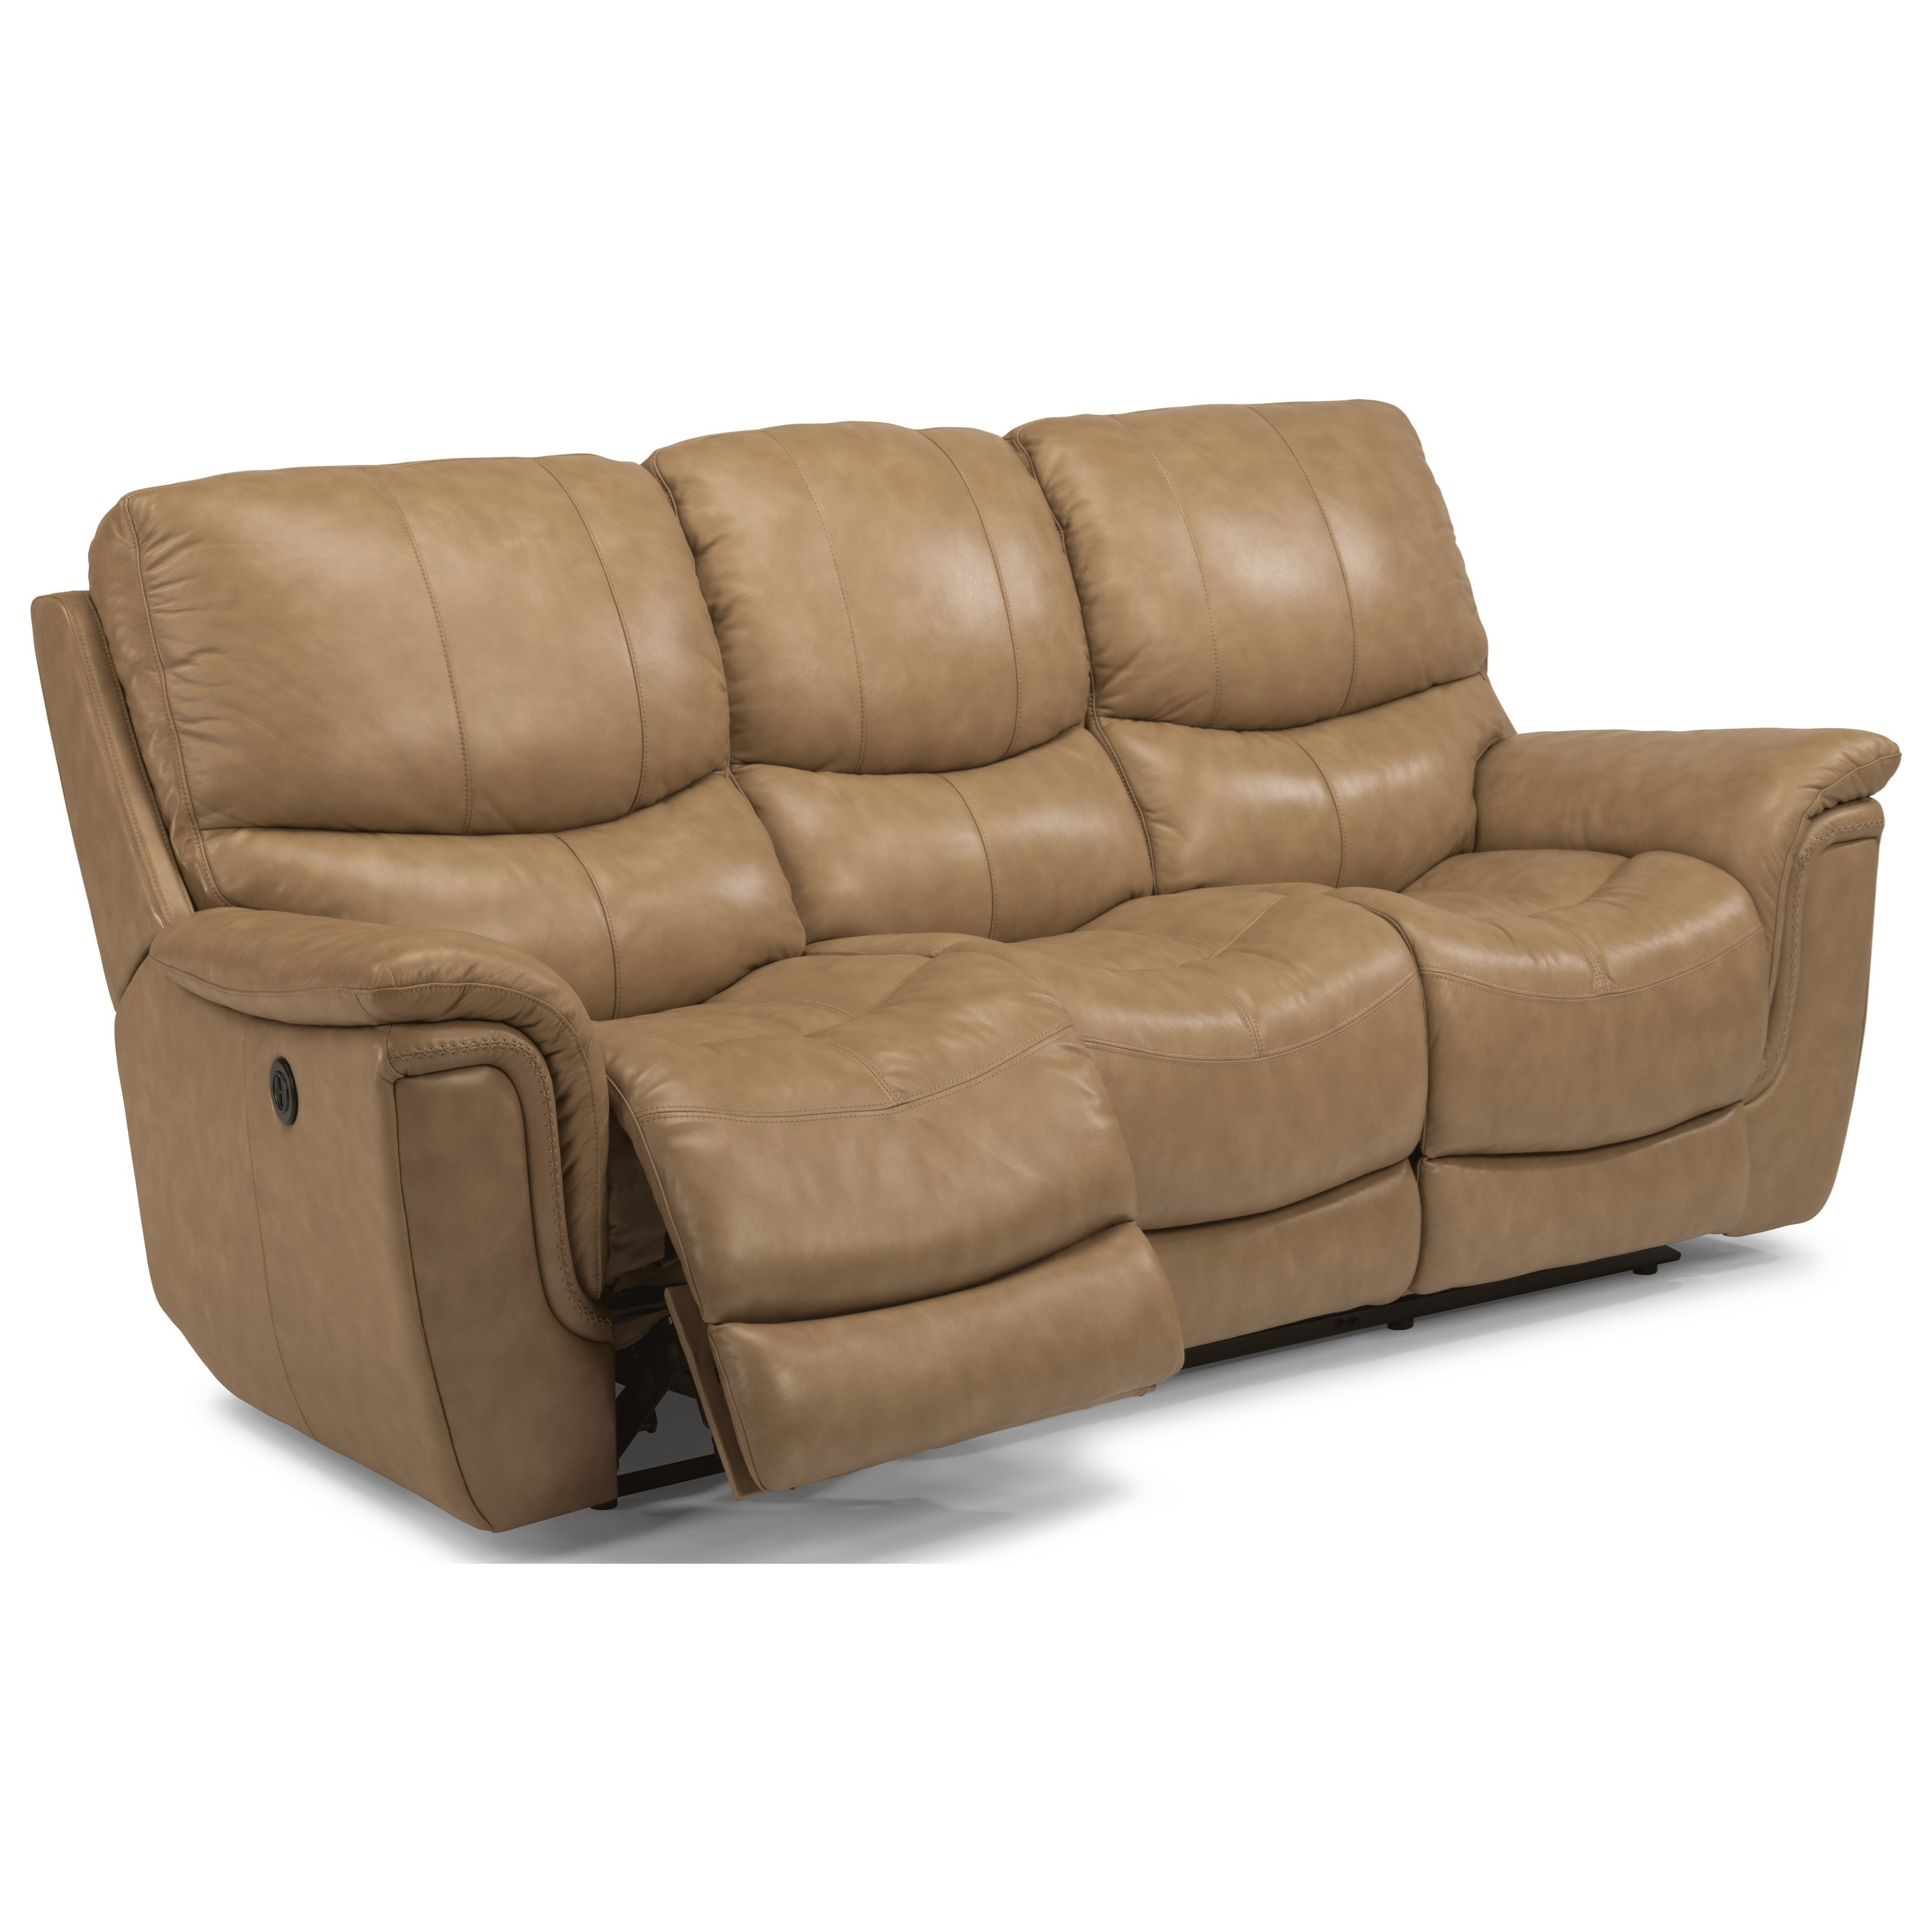 Flexsteel Latitudes Coco 1851 62p Casual Power Reclining Sofa With Usb Ports Dunk Bright